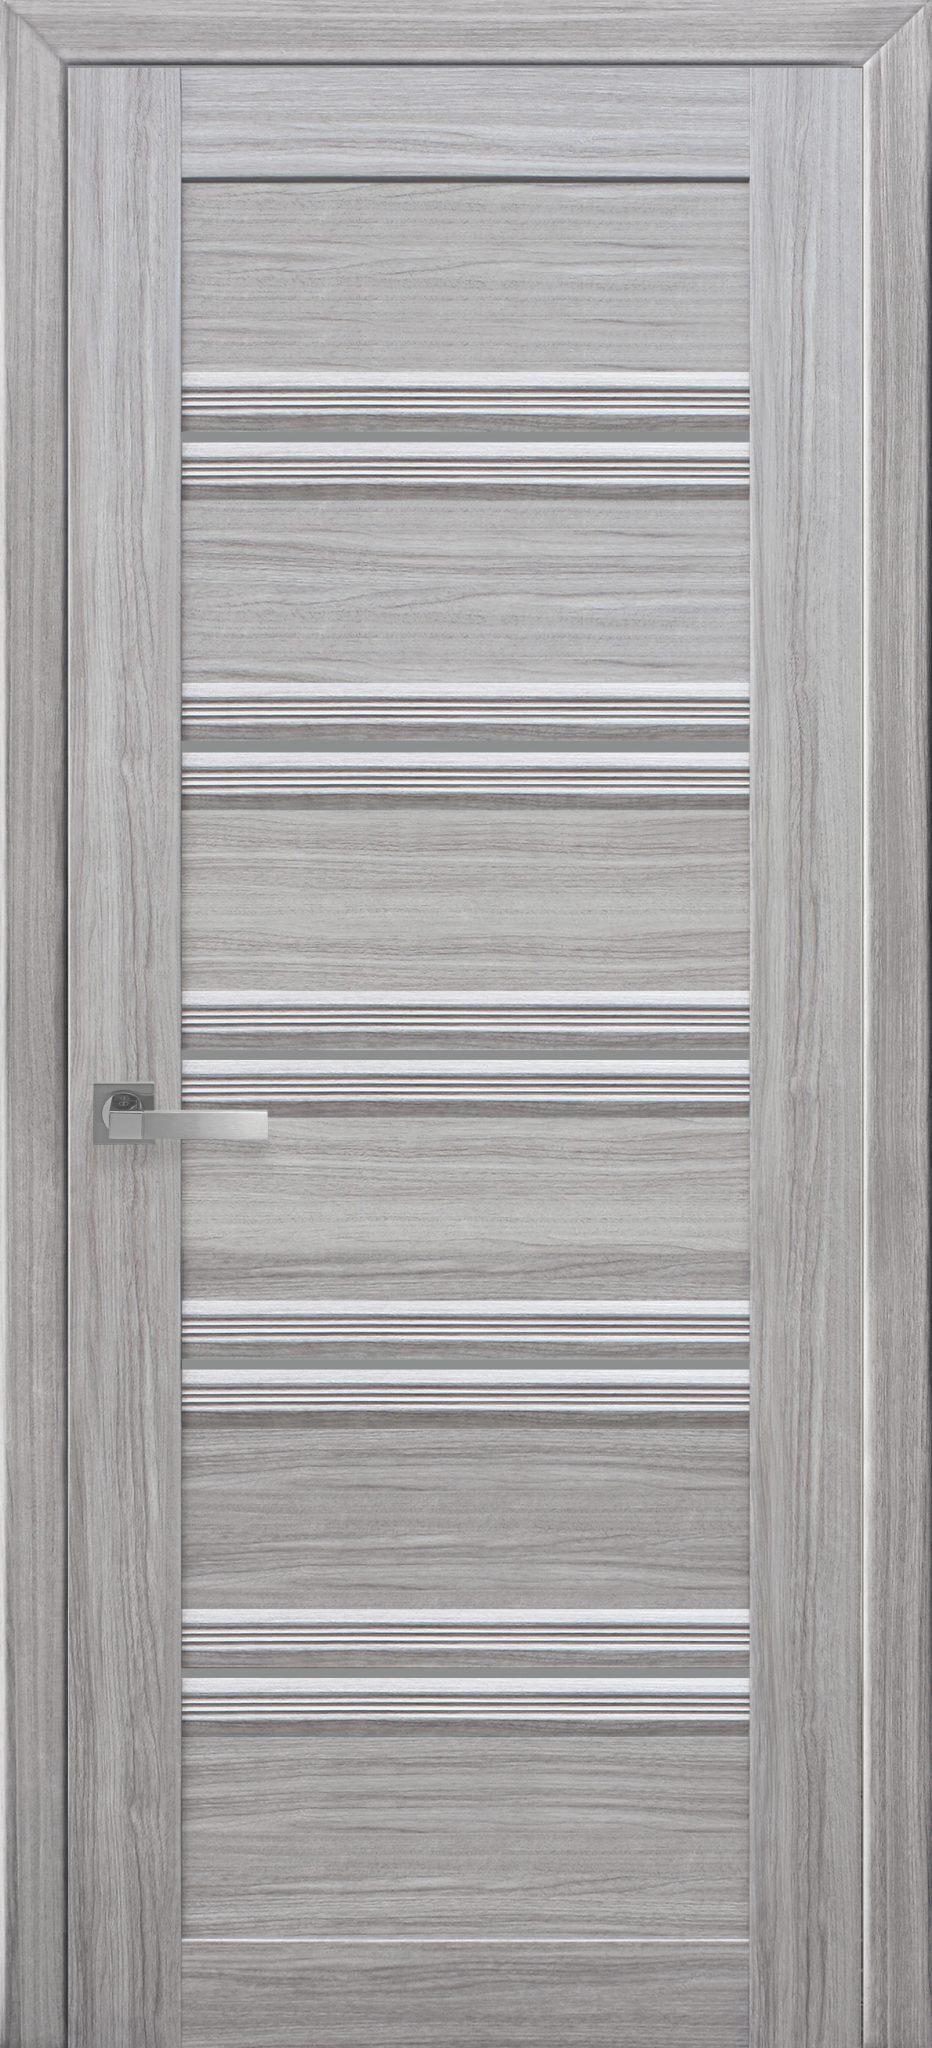 Межкомнатные двери Виченца С1